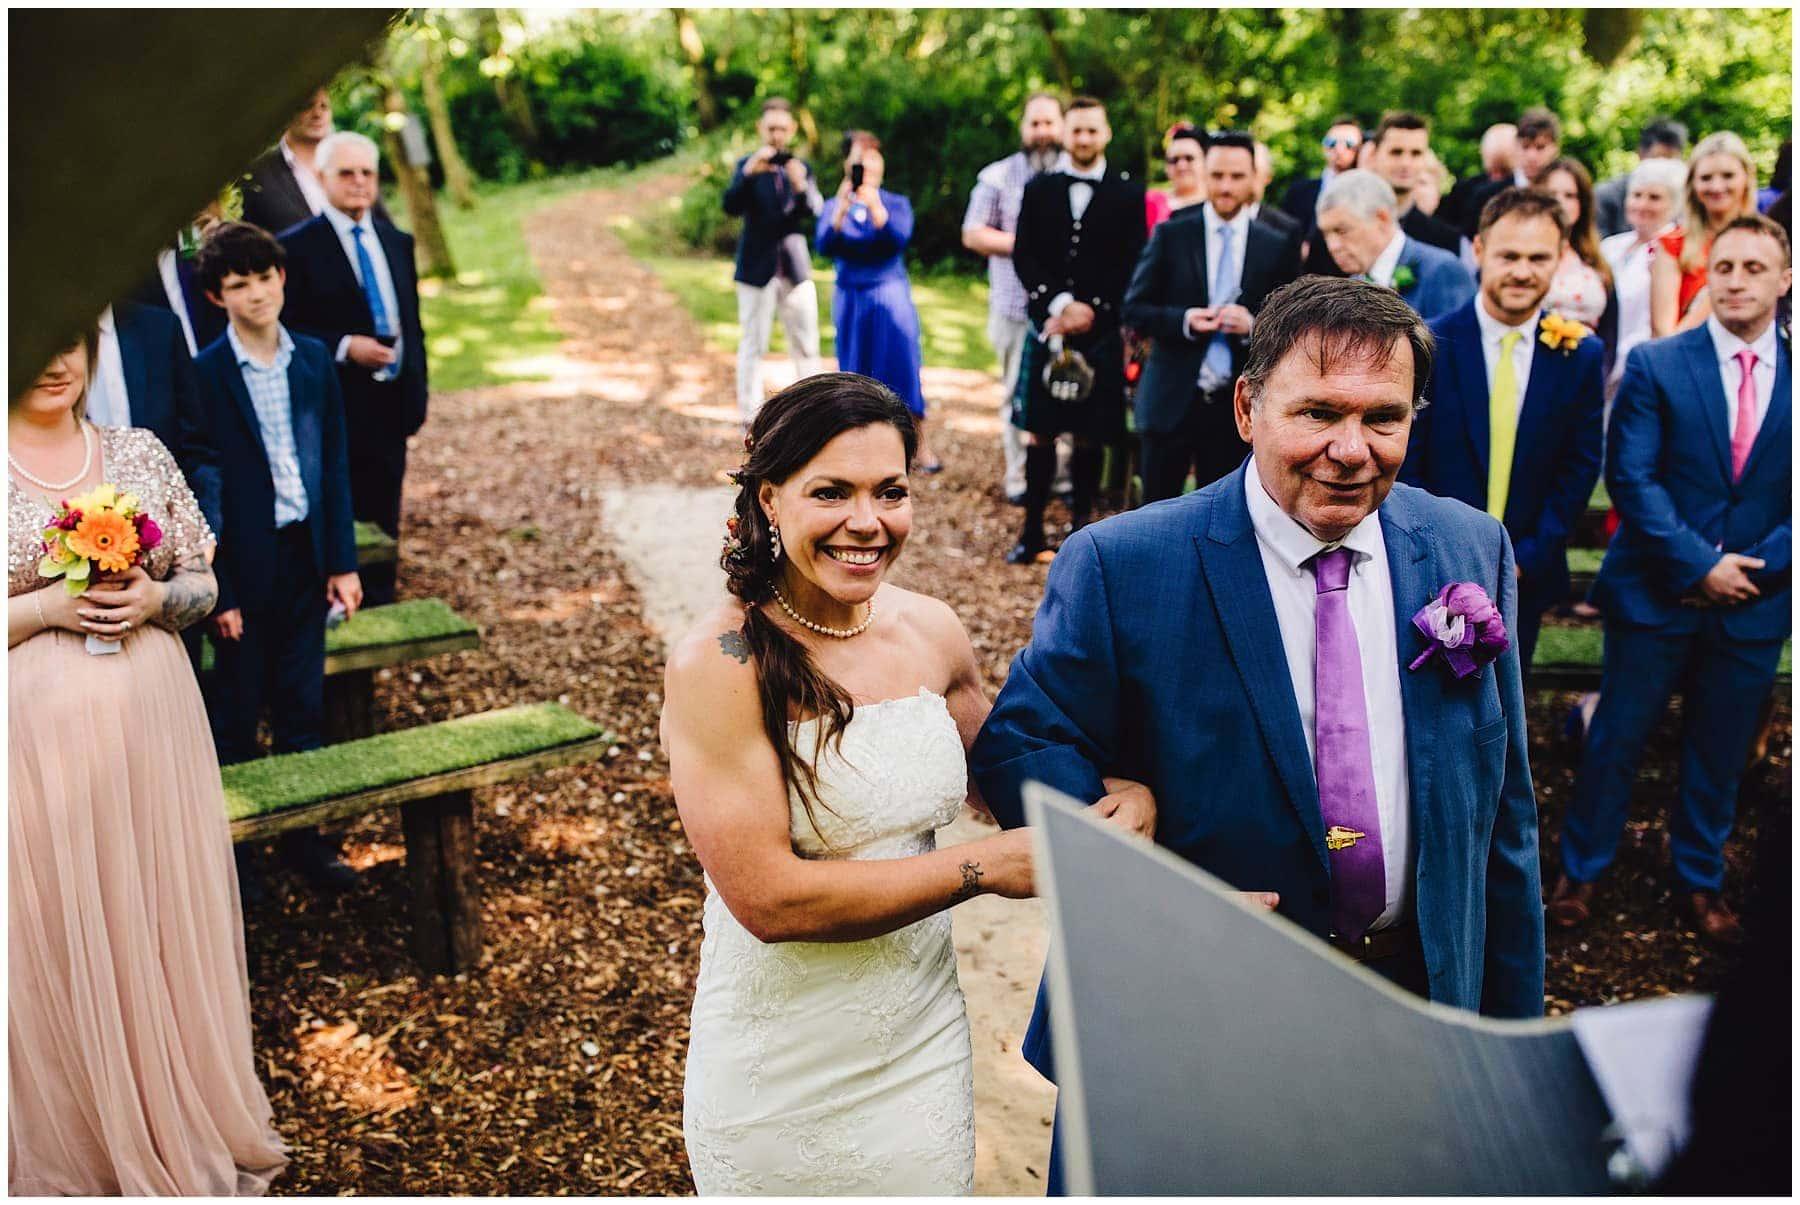 Hothorp Hall Woodlands Wedding Photographer 17